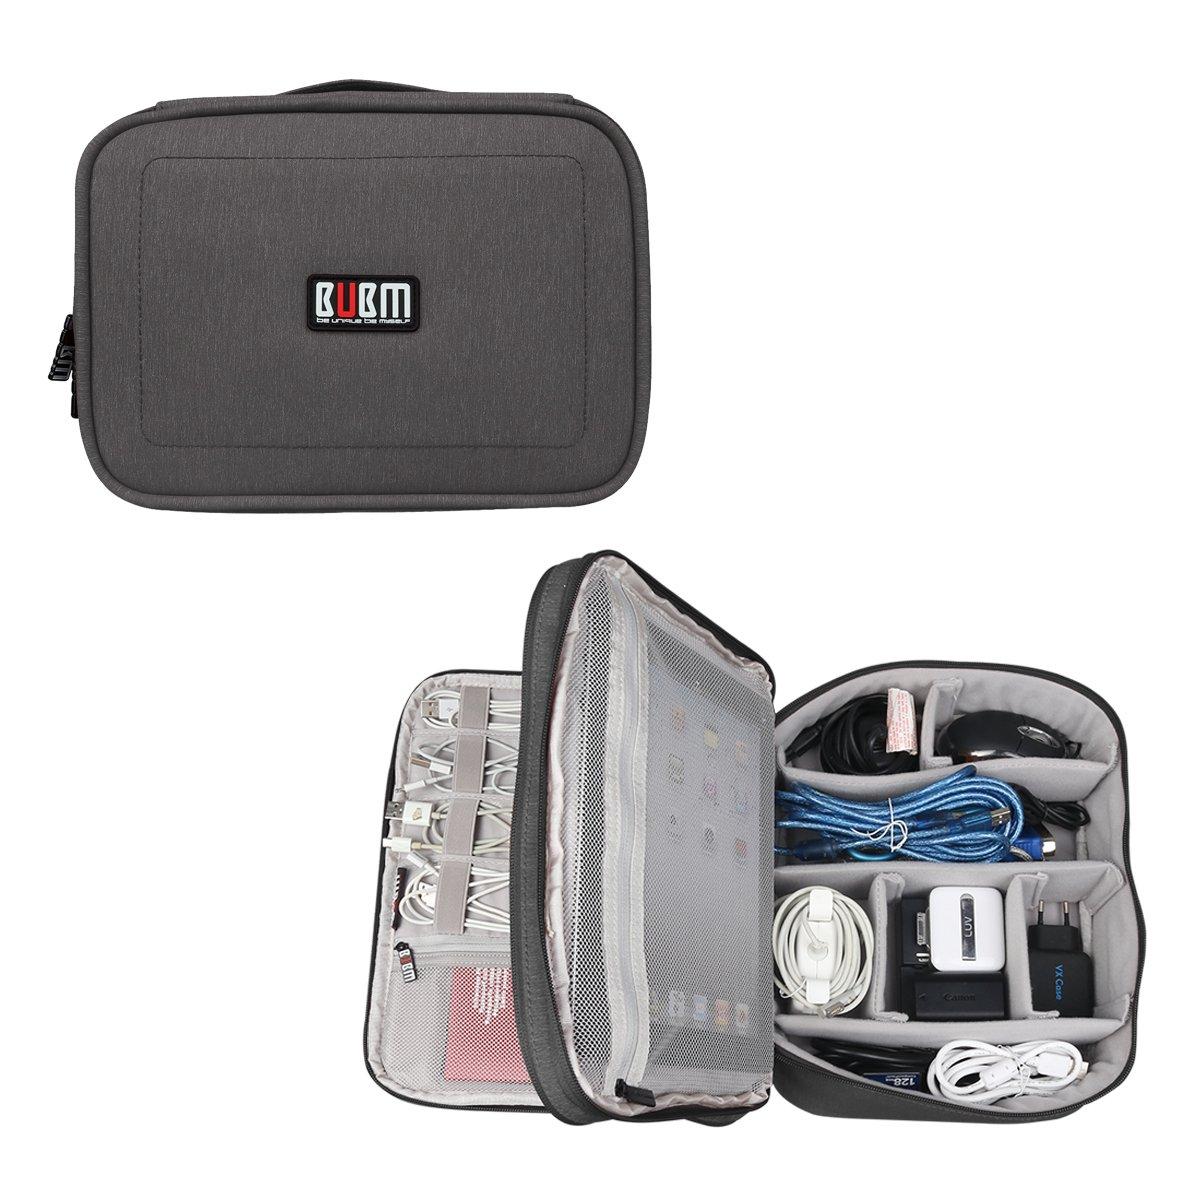 BUBM Universal Electronics Travel Organizer Computer Cable Electronic Organizer Travel Office Gear Organizer Electronics Accessories Bag Lagre Gadget Carry Storage Bag Pouch Black